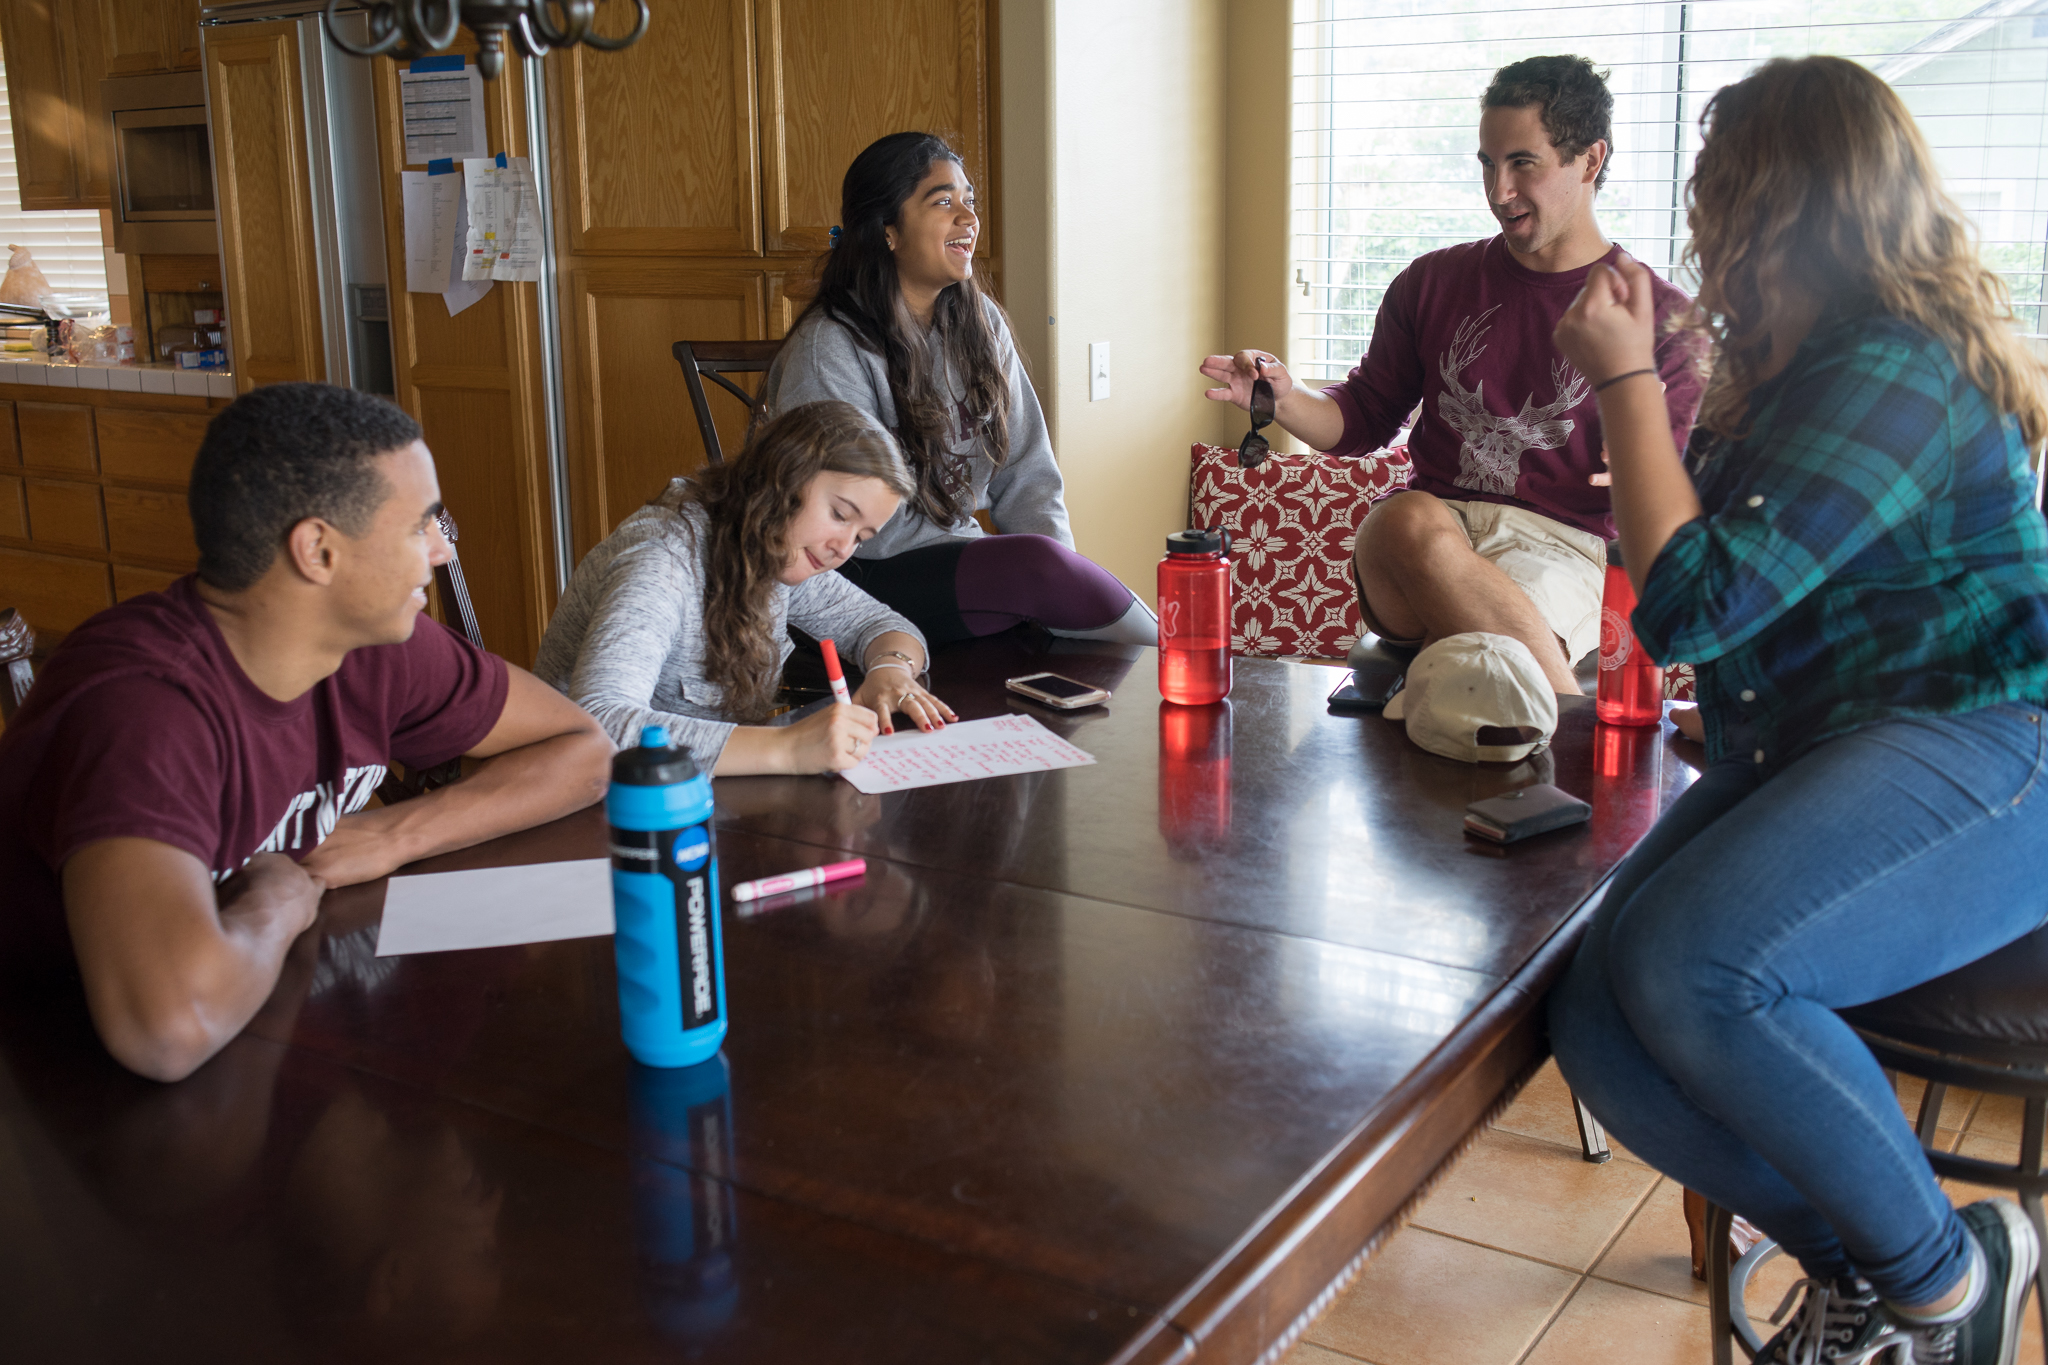 Students brainstorming ideas at the Moonshot House. Photo courtesy of Wes Edwards '18.